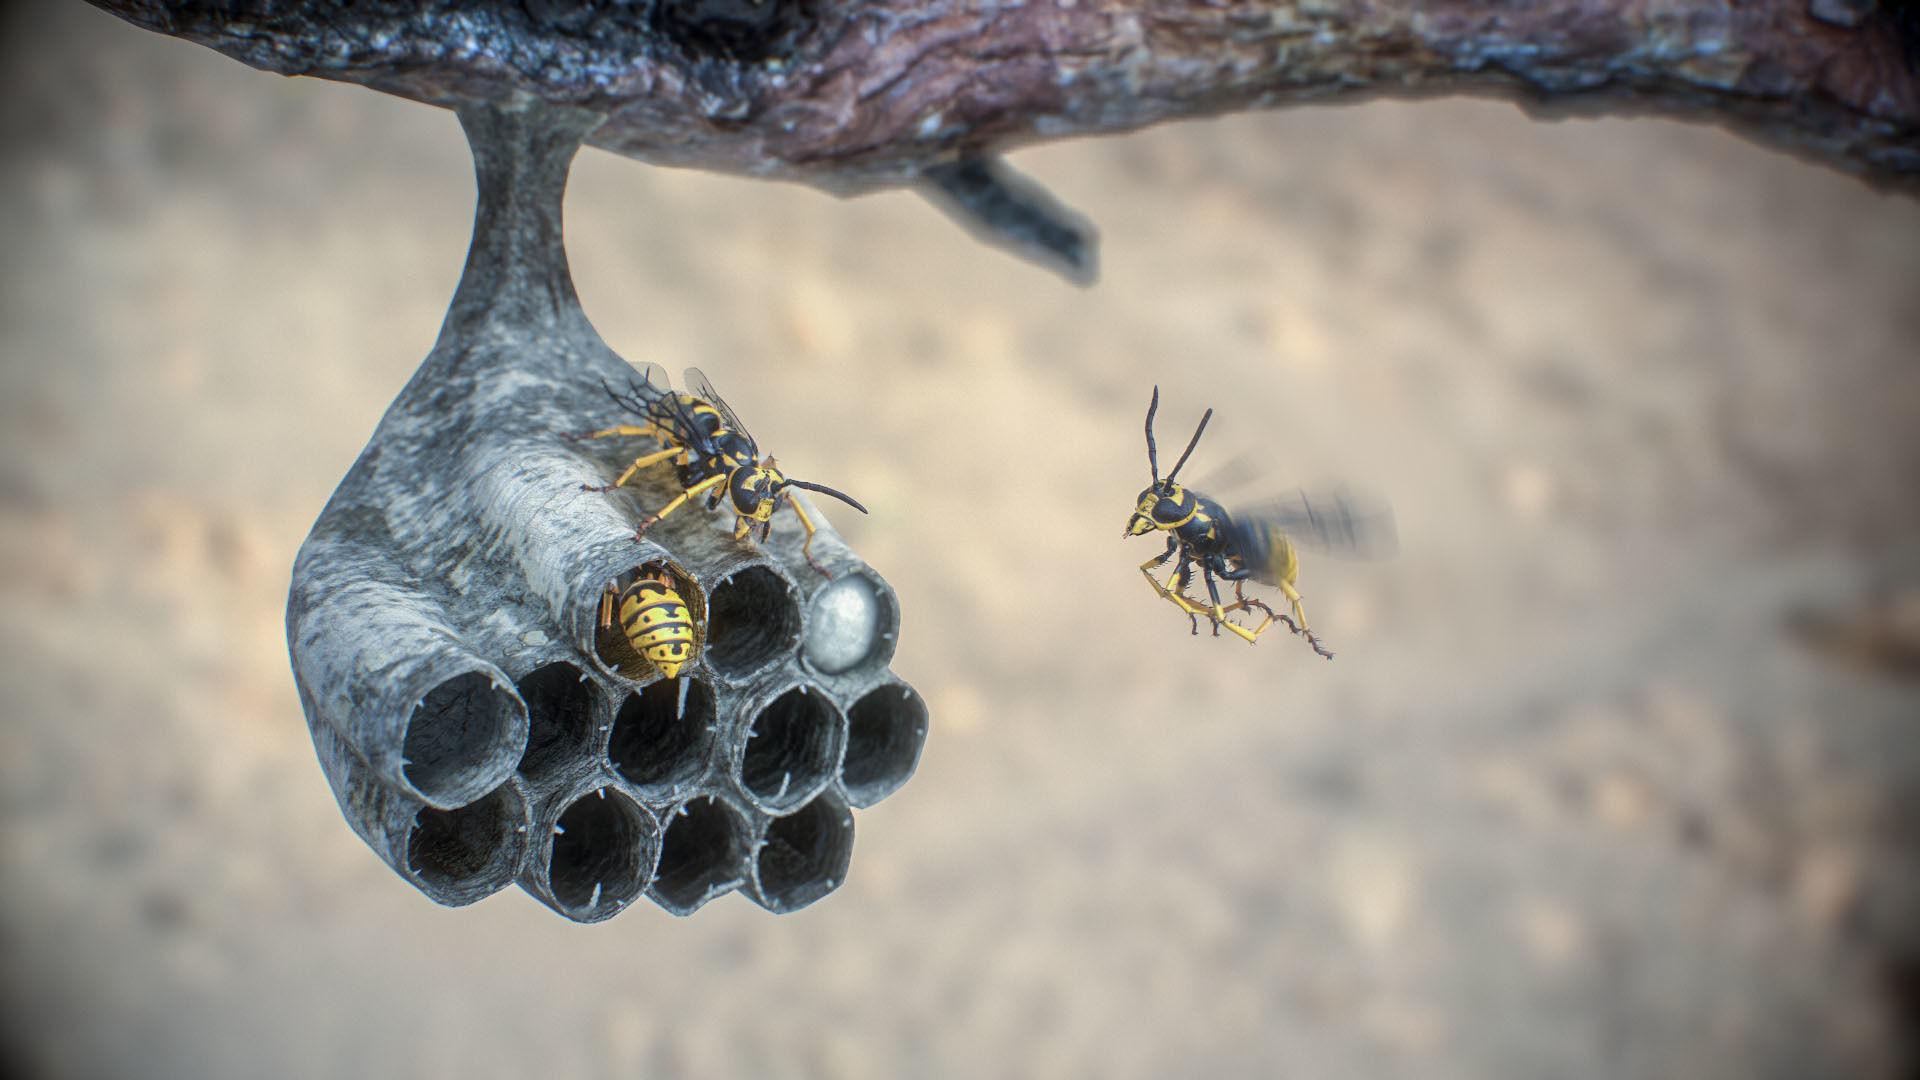 Nest wasps